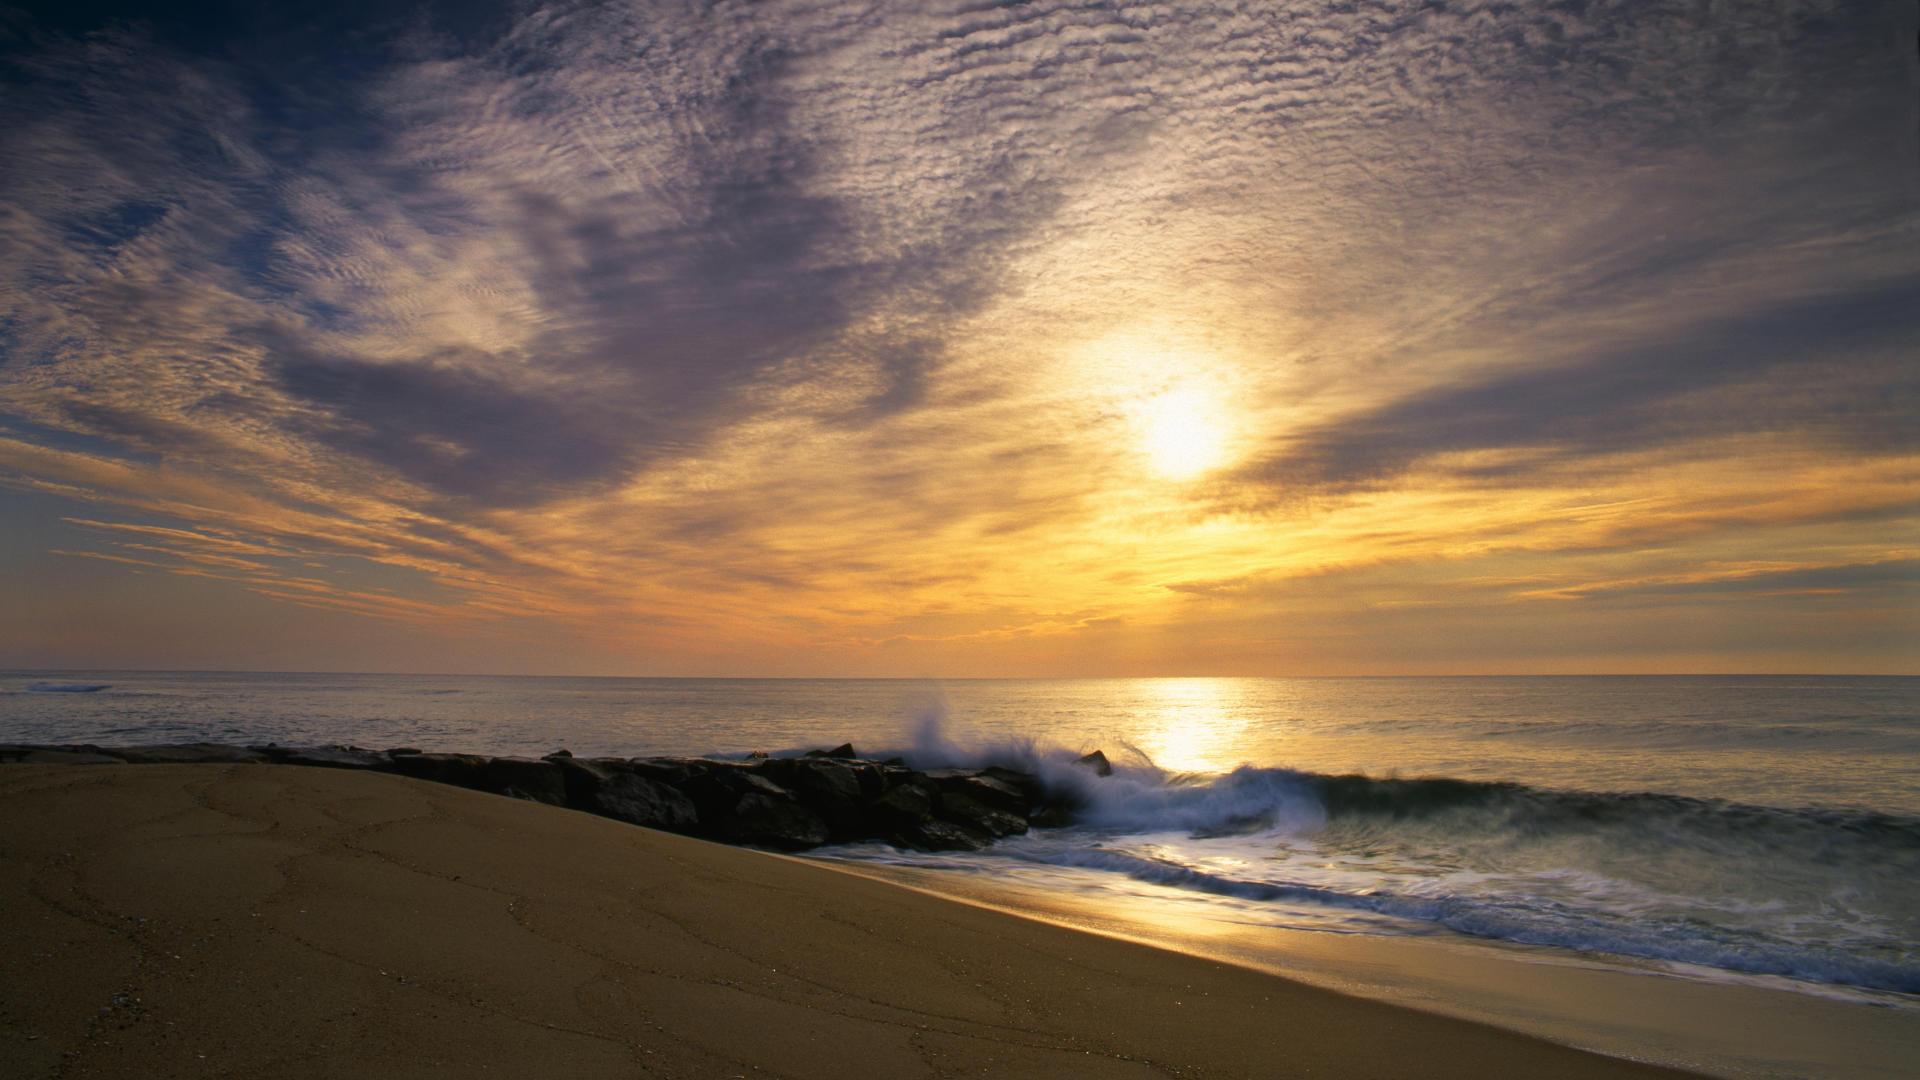 backgrounds desktop city ocean maryland surf crashing beach 1920x1080